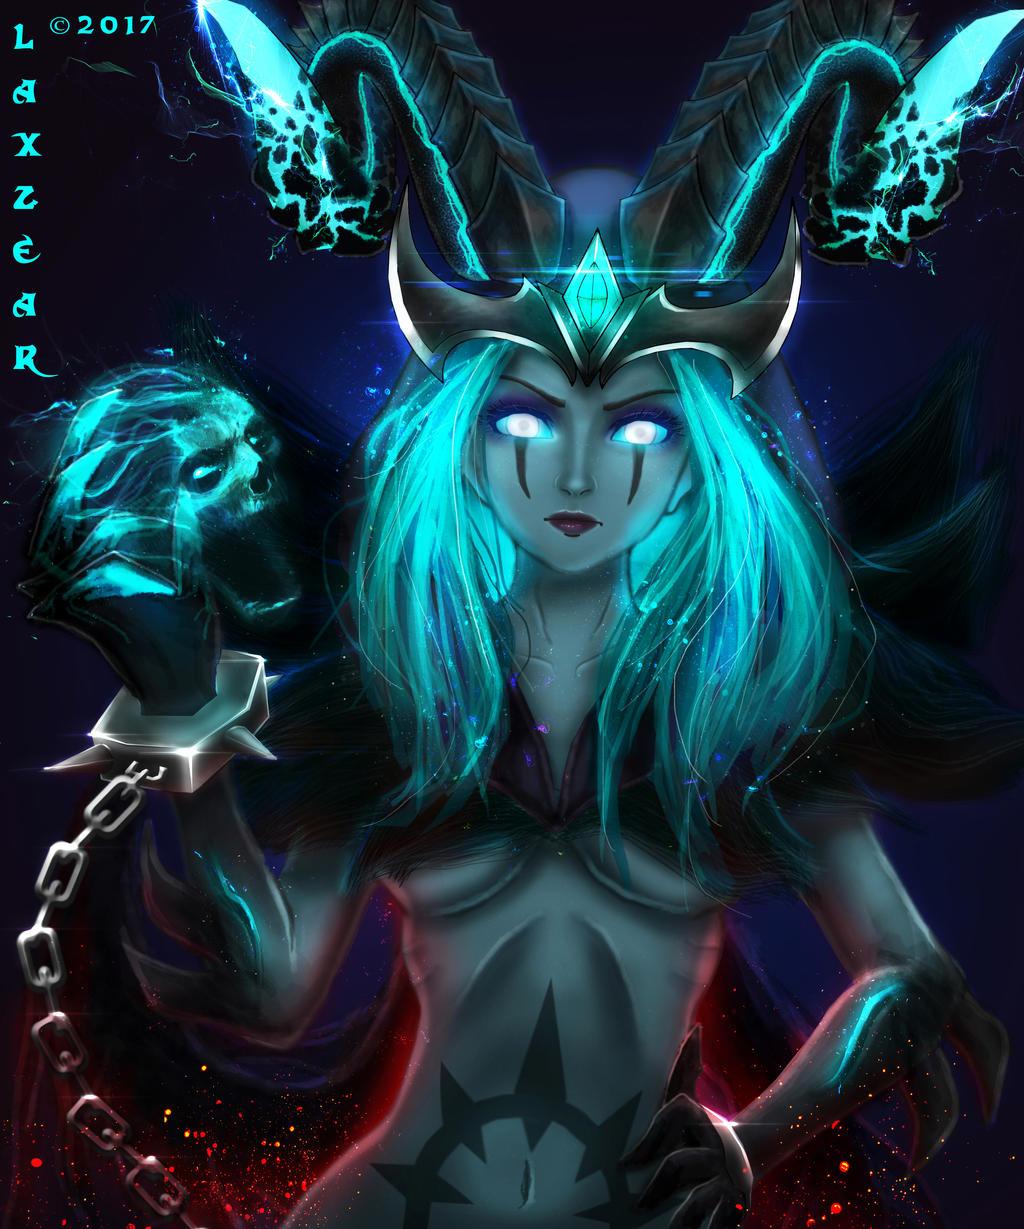 Mobile Legends Vexana By Laxzear On DeviantArt